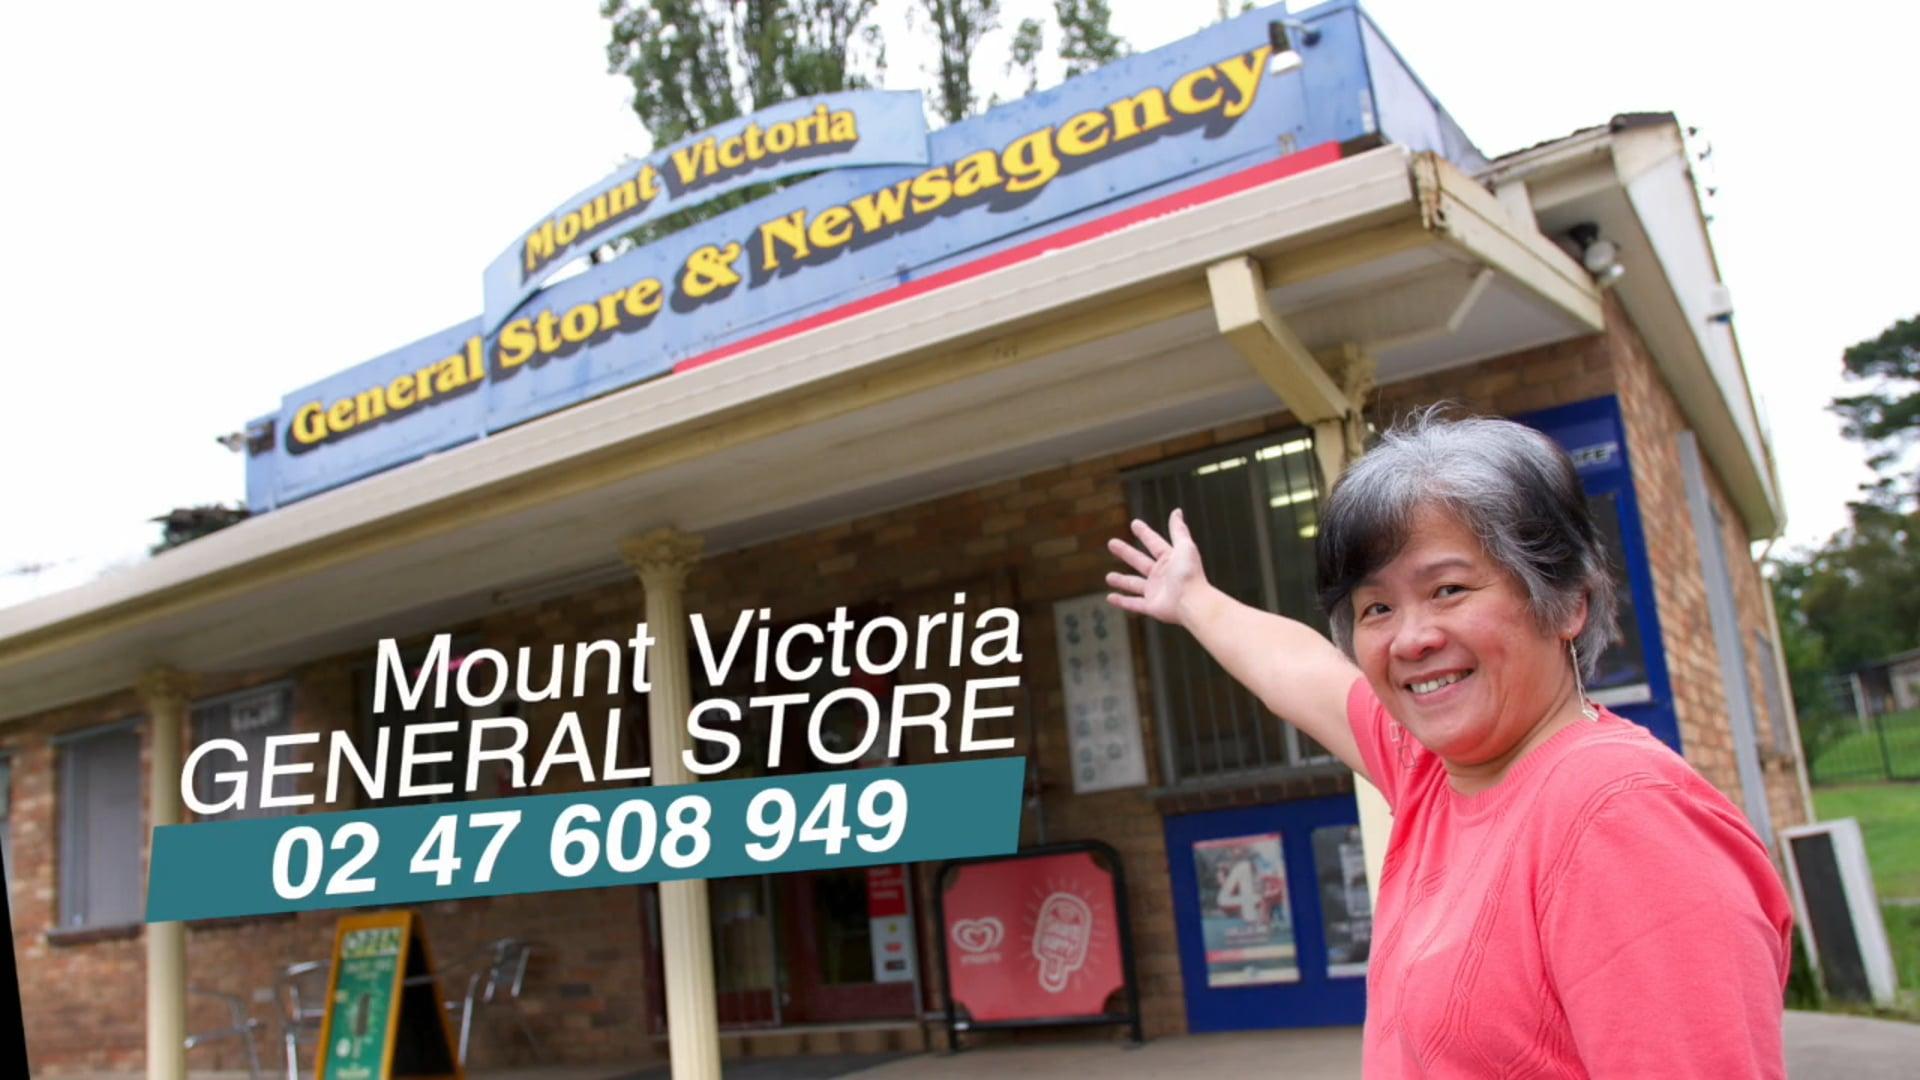 Mount Victoria General Store - Mount Victoria